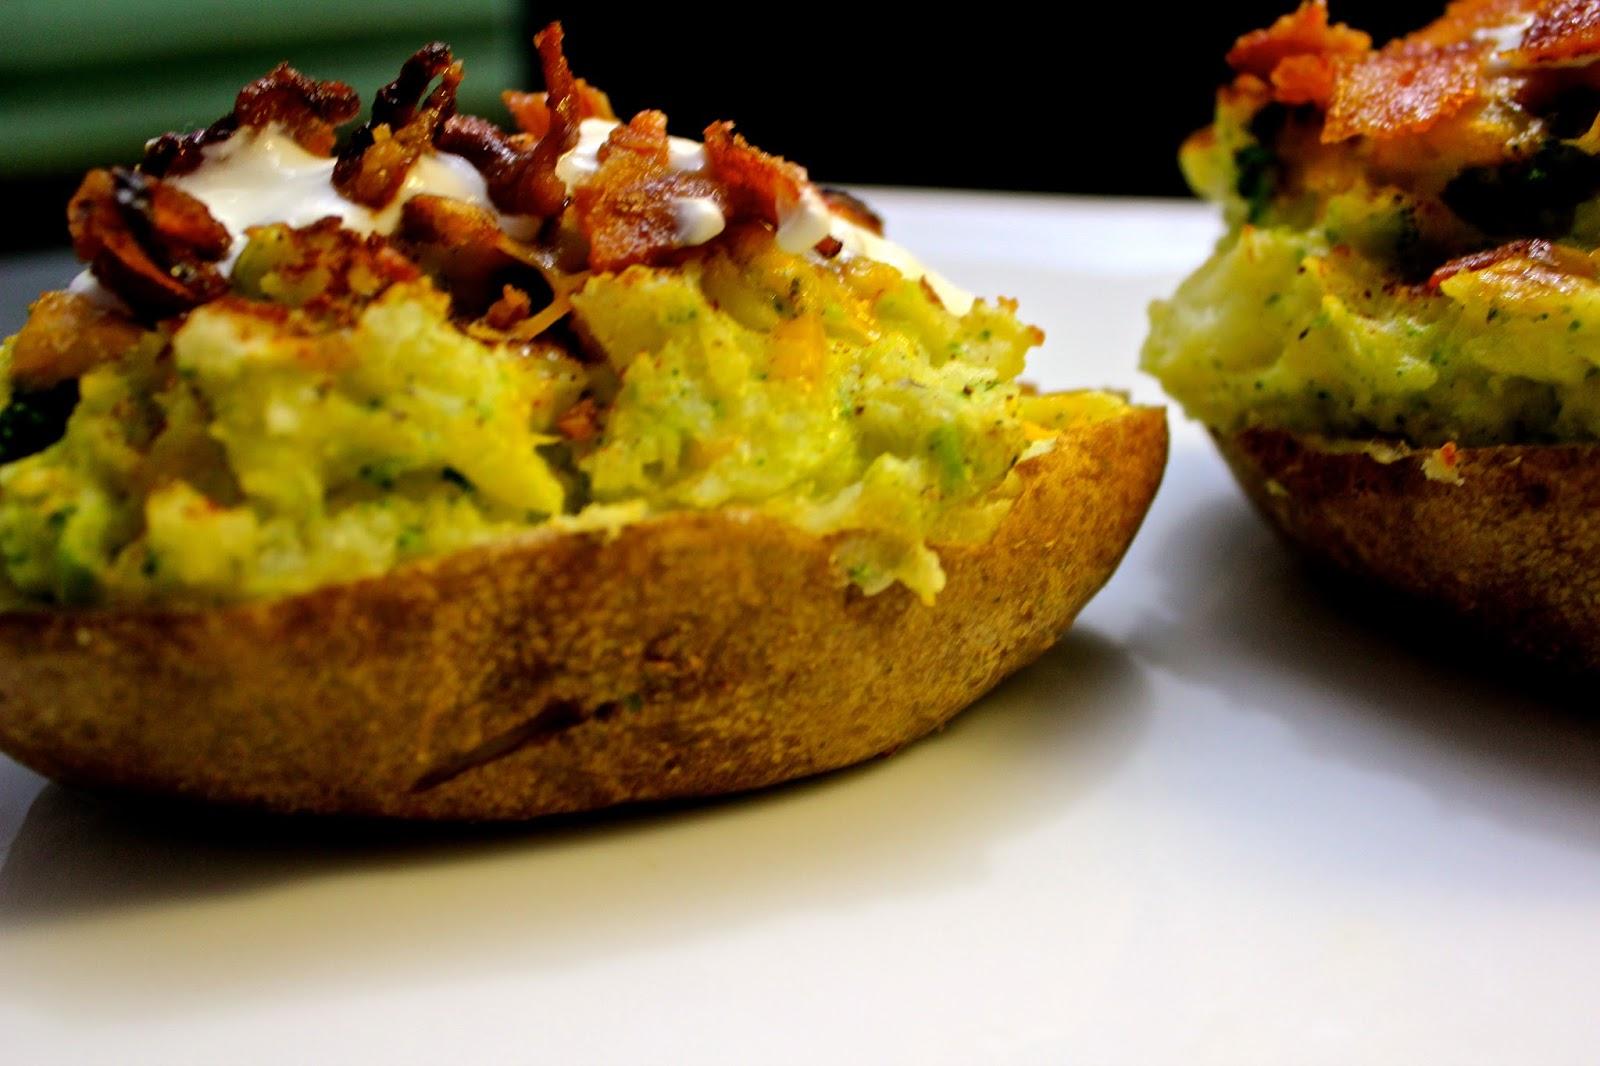 Charleston's Chew: Broccoli, Cheddar, Bacon Twice Baked Potatoes